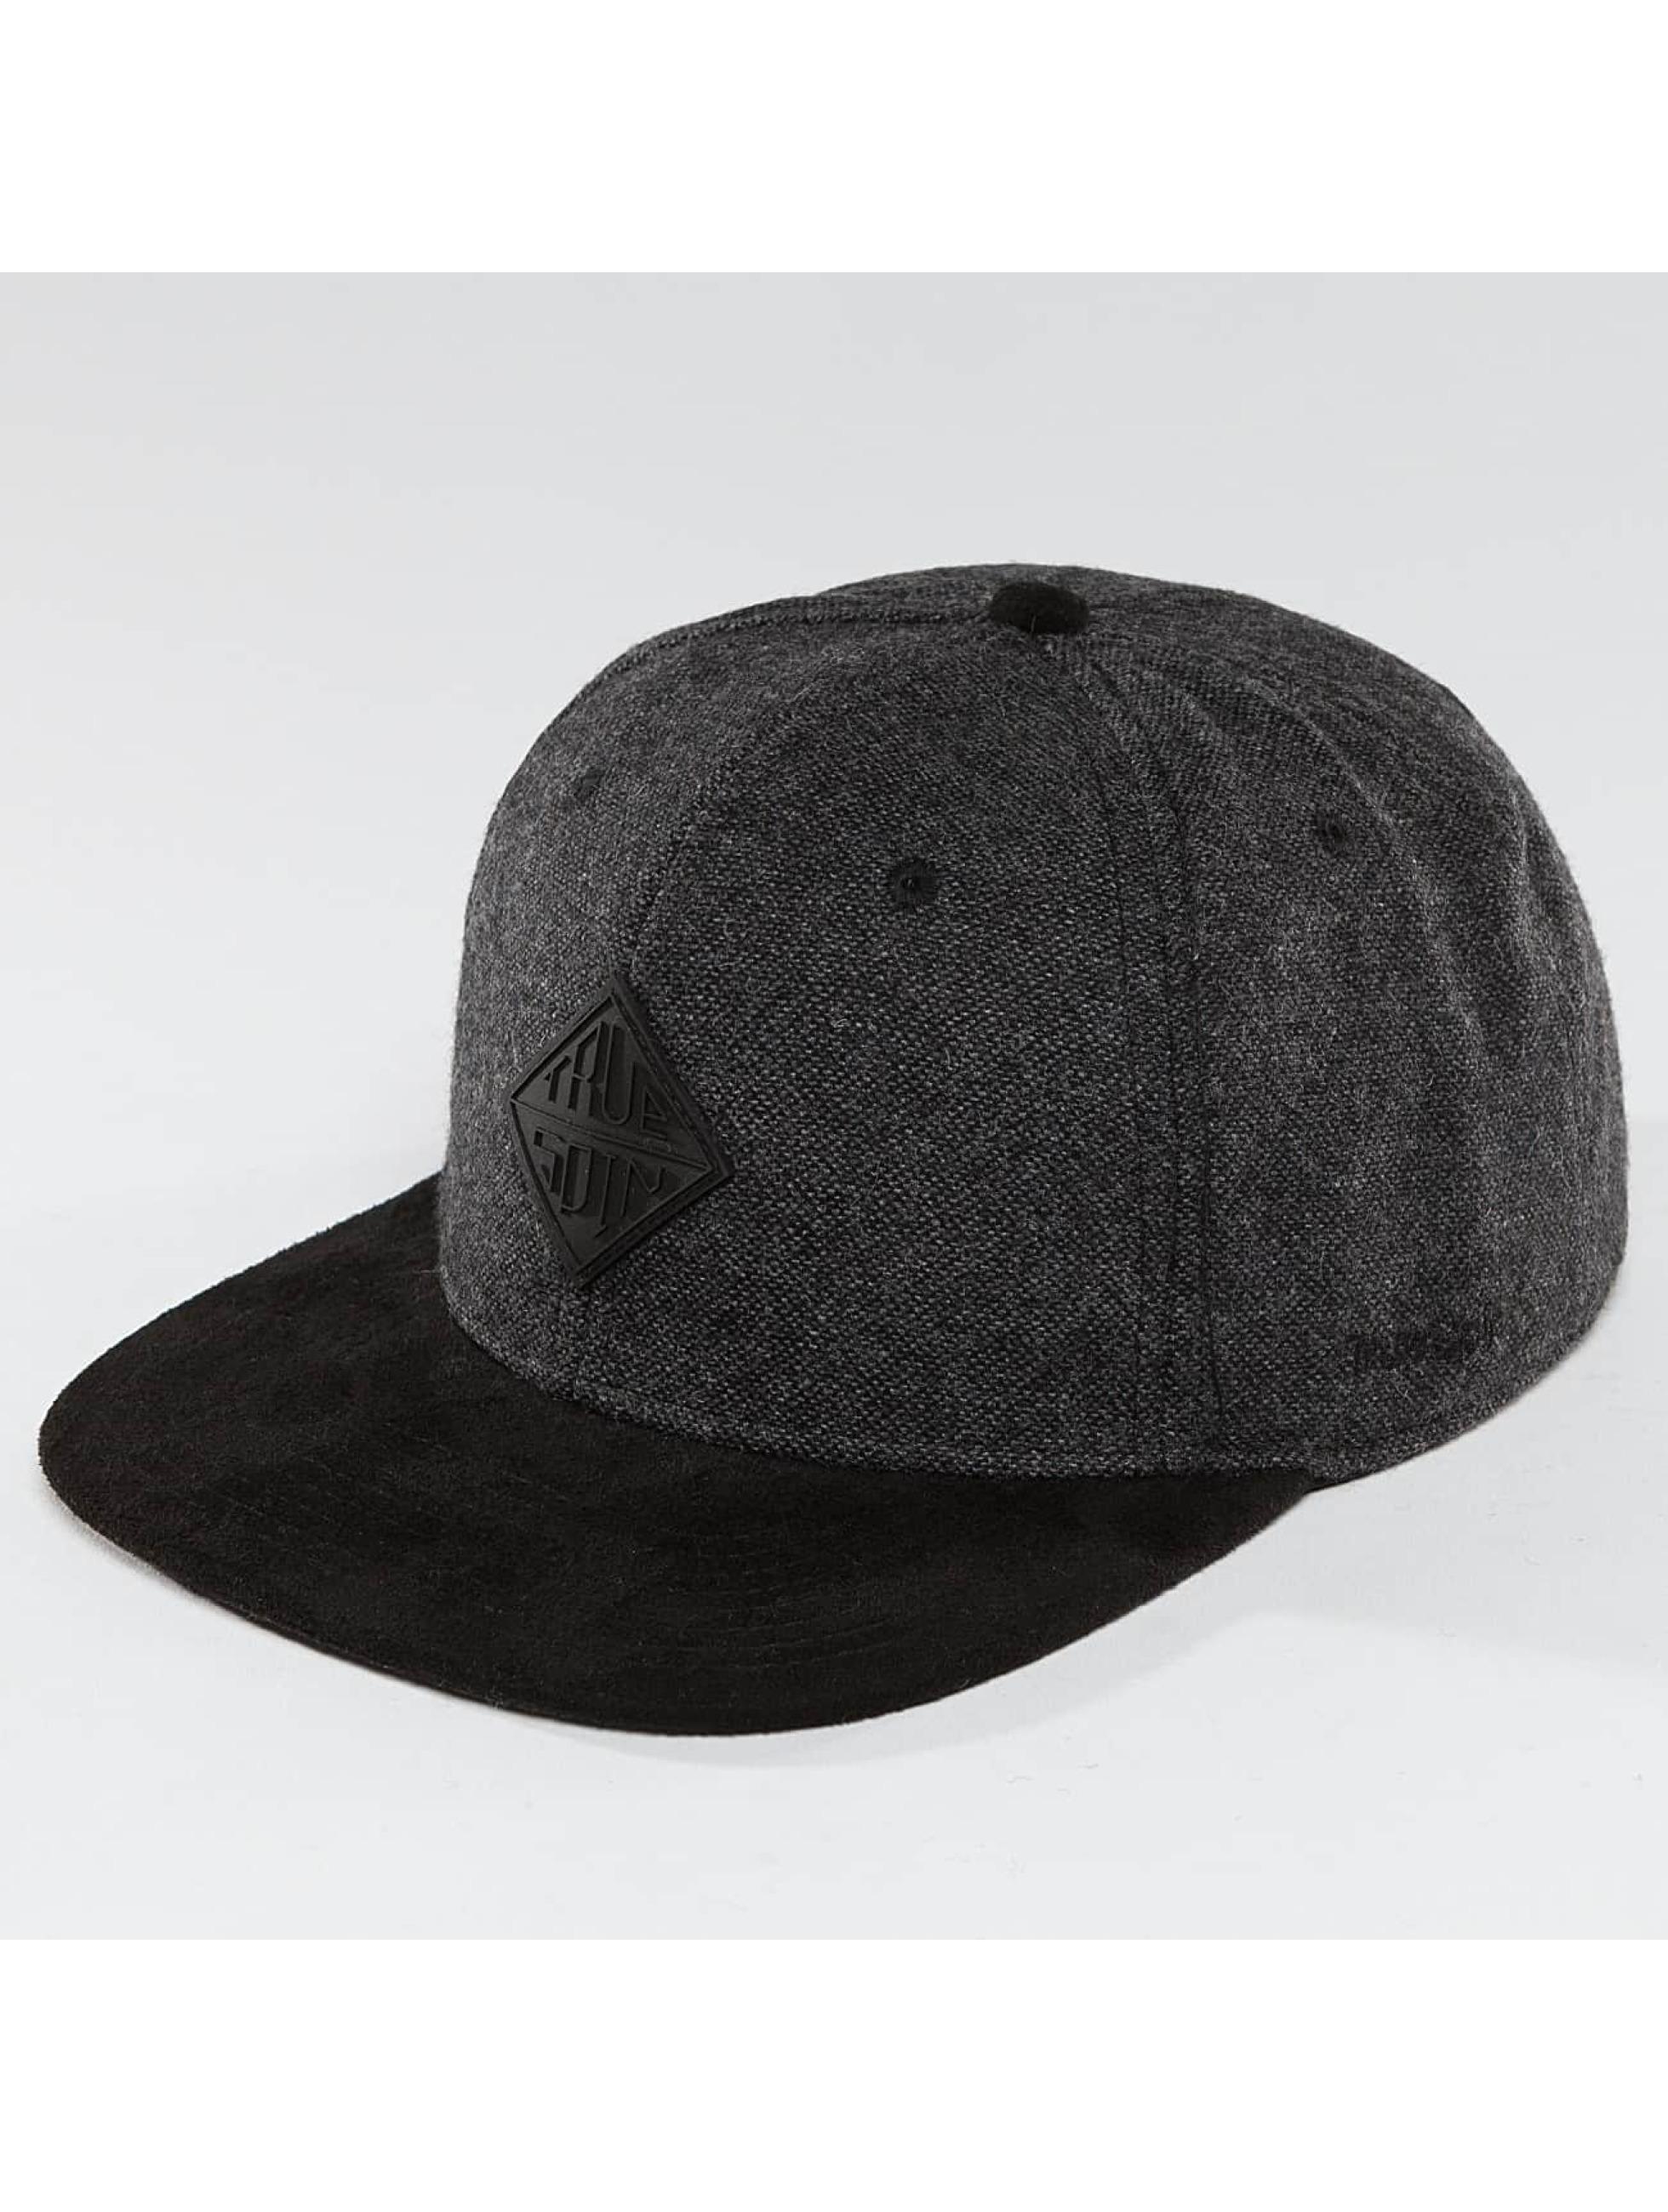 TrueSpin Männer,Frauen Snapback Cap Rubber Taper in grau